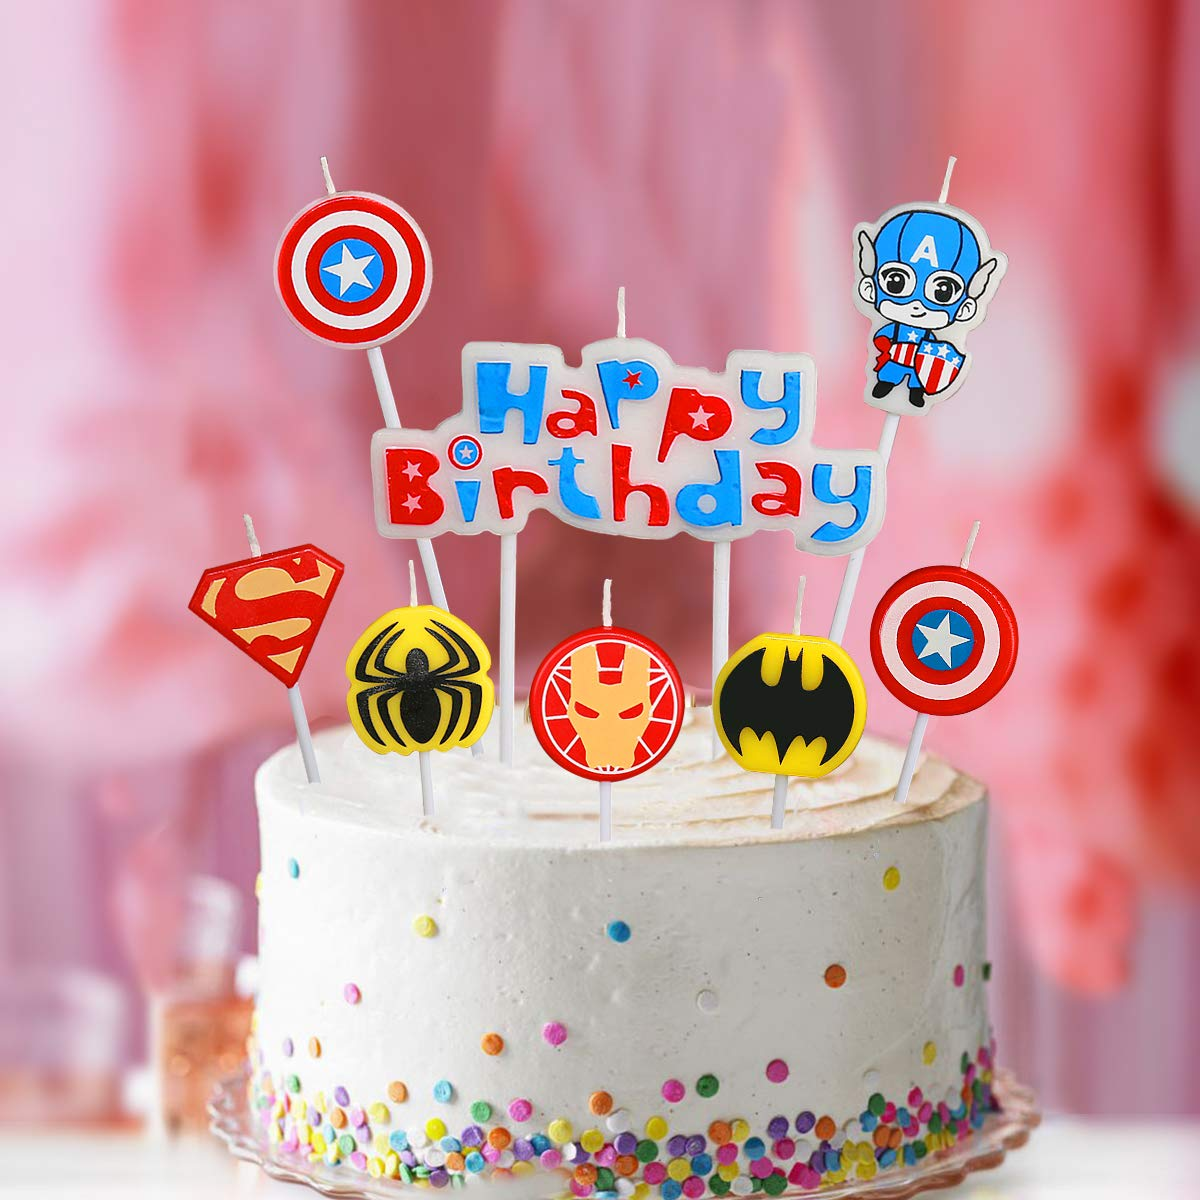 Amazon Pinkblume Happy Birthday Decorative Cake Candle Set For